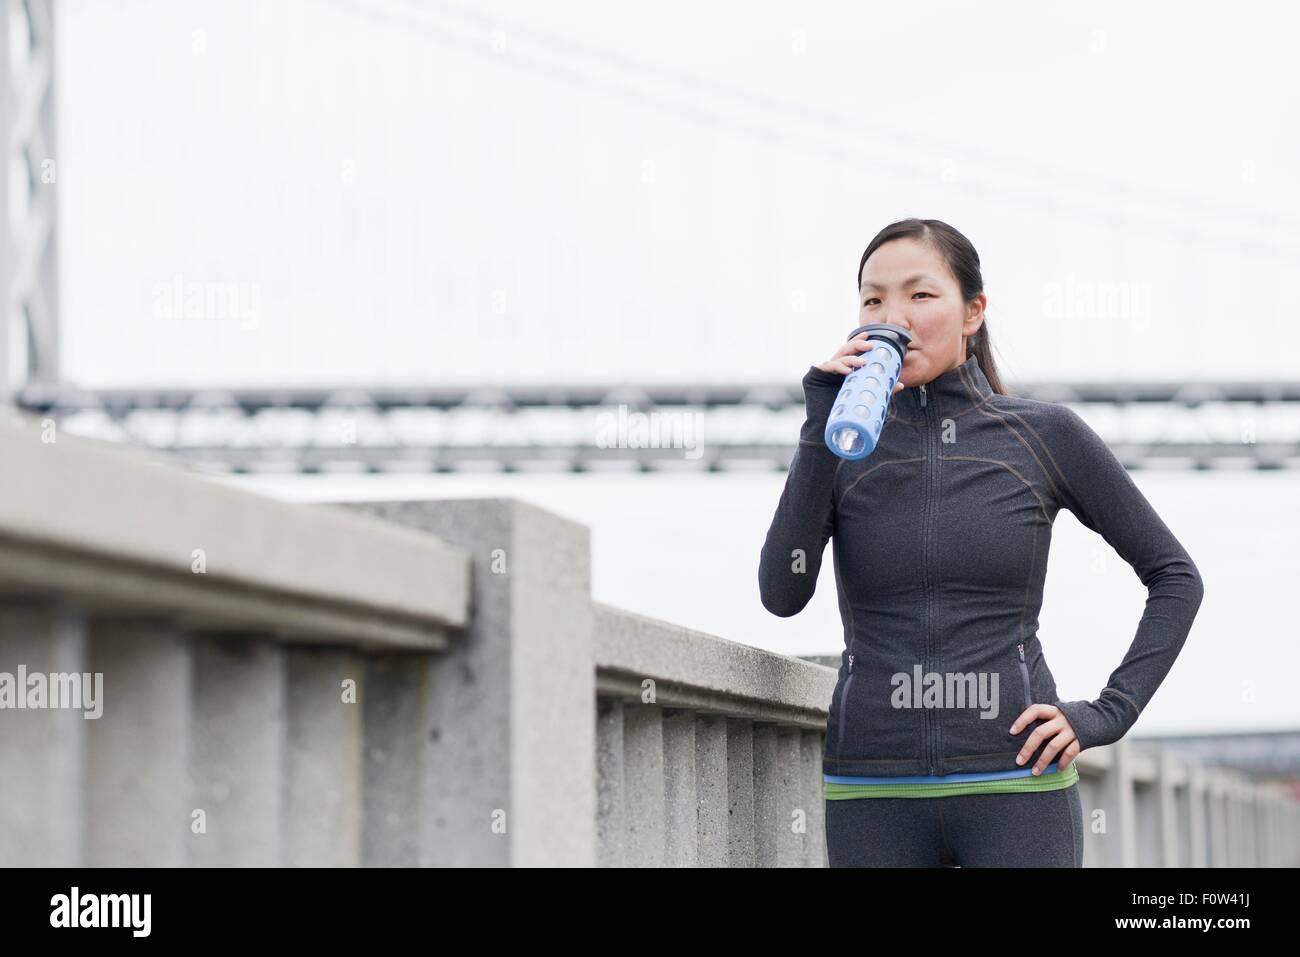 Female runner drinking on bridge, San Francisco, California Stock Photo